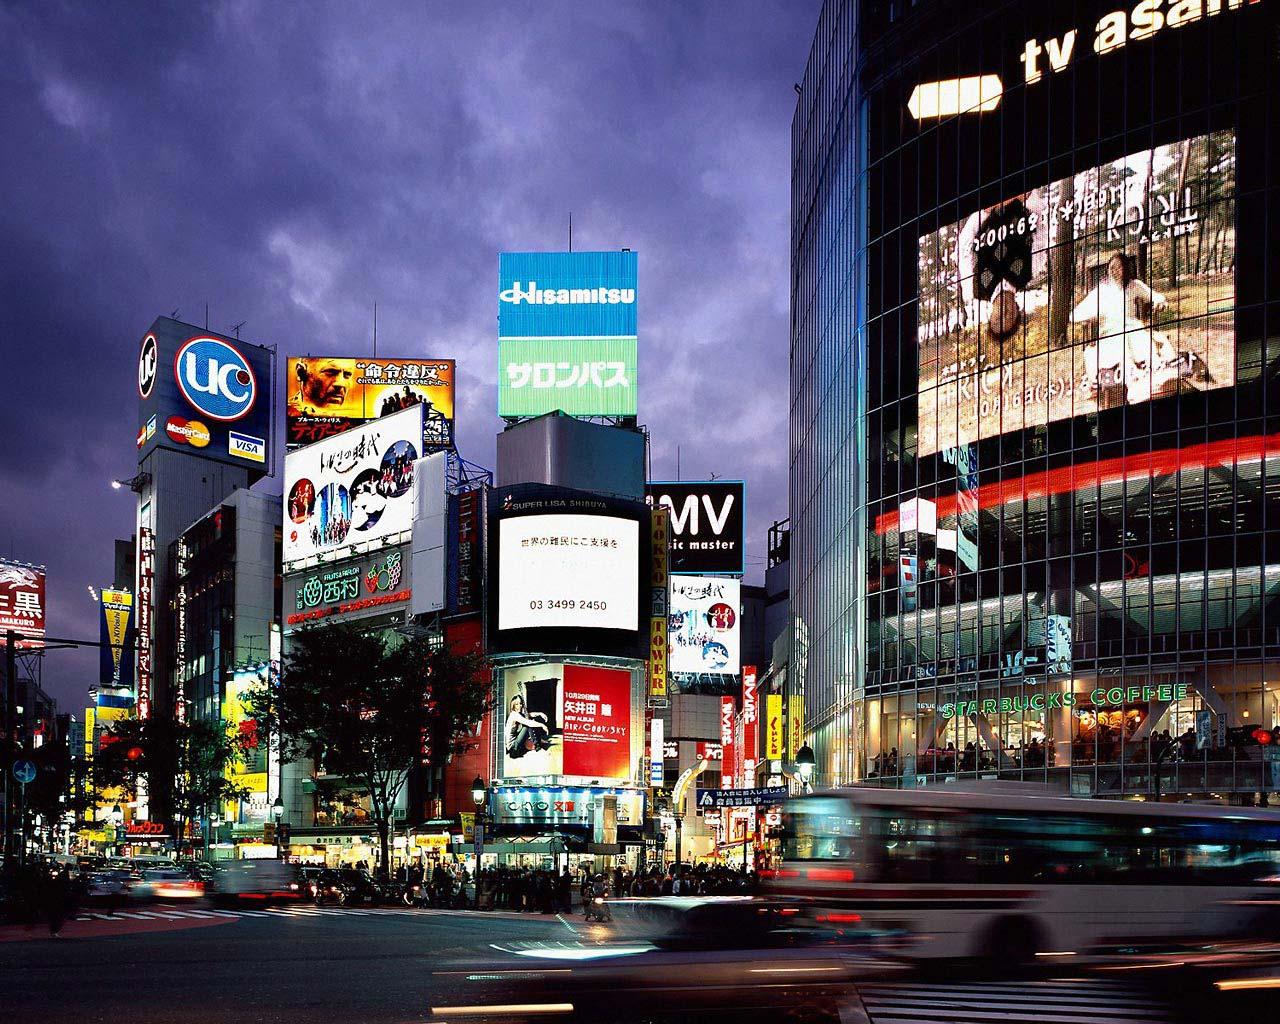 Hai visto? Tokyo: la citta' piu' popolosa del Mondo